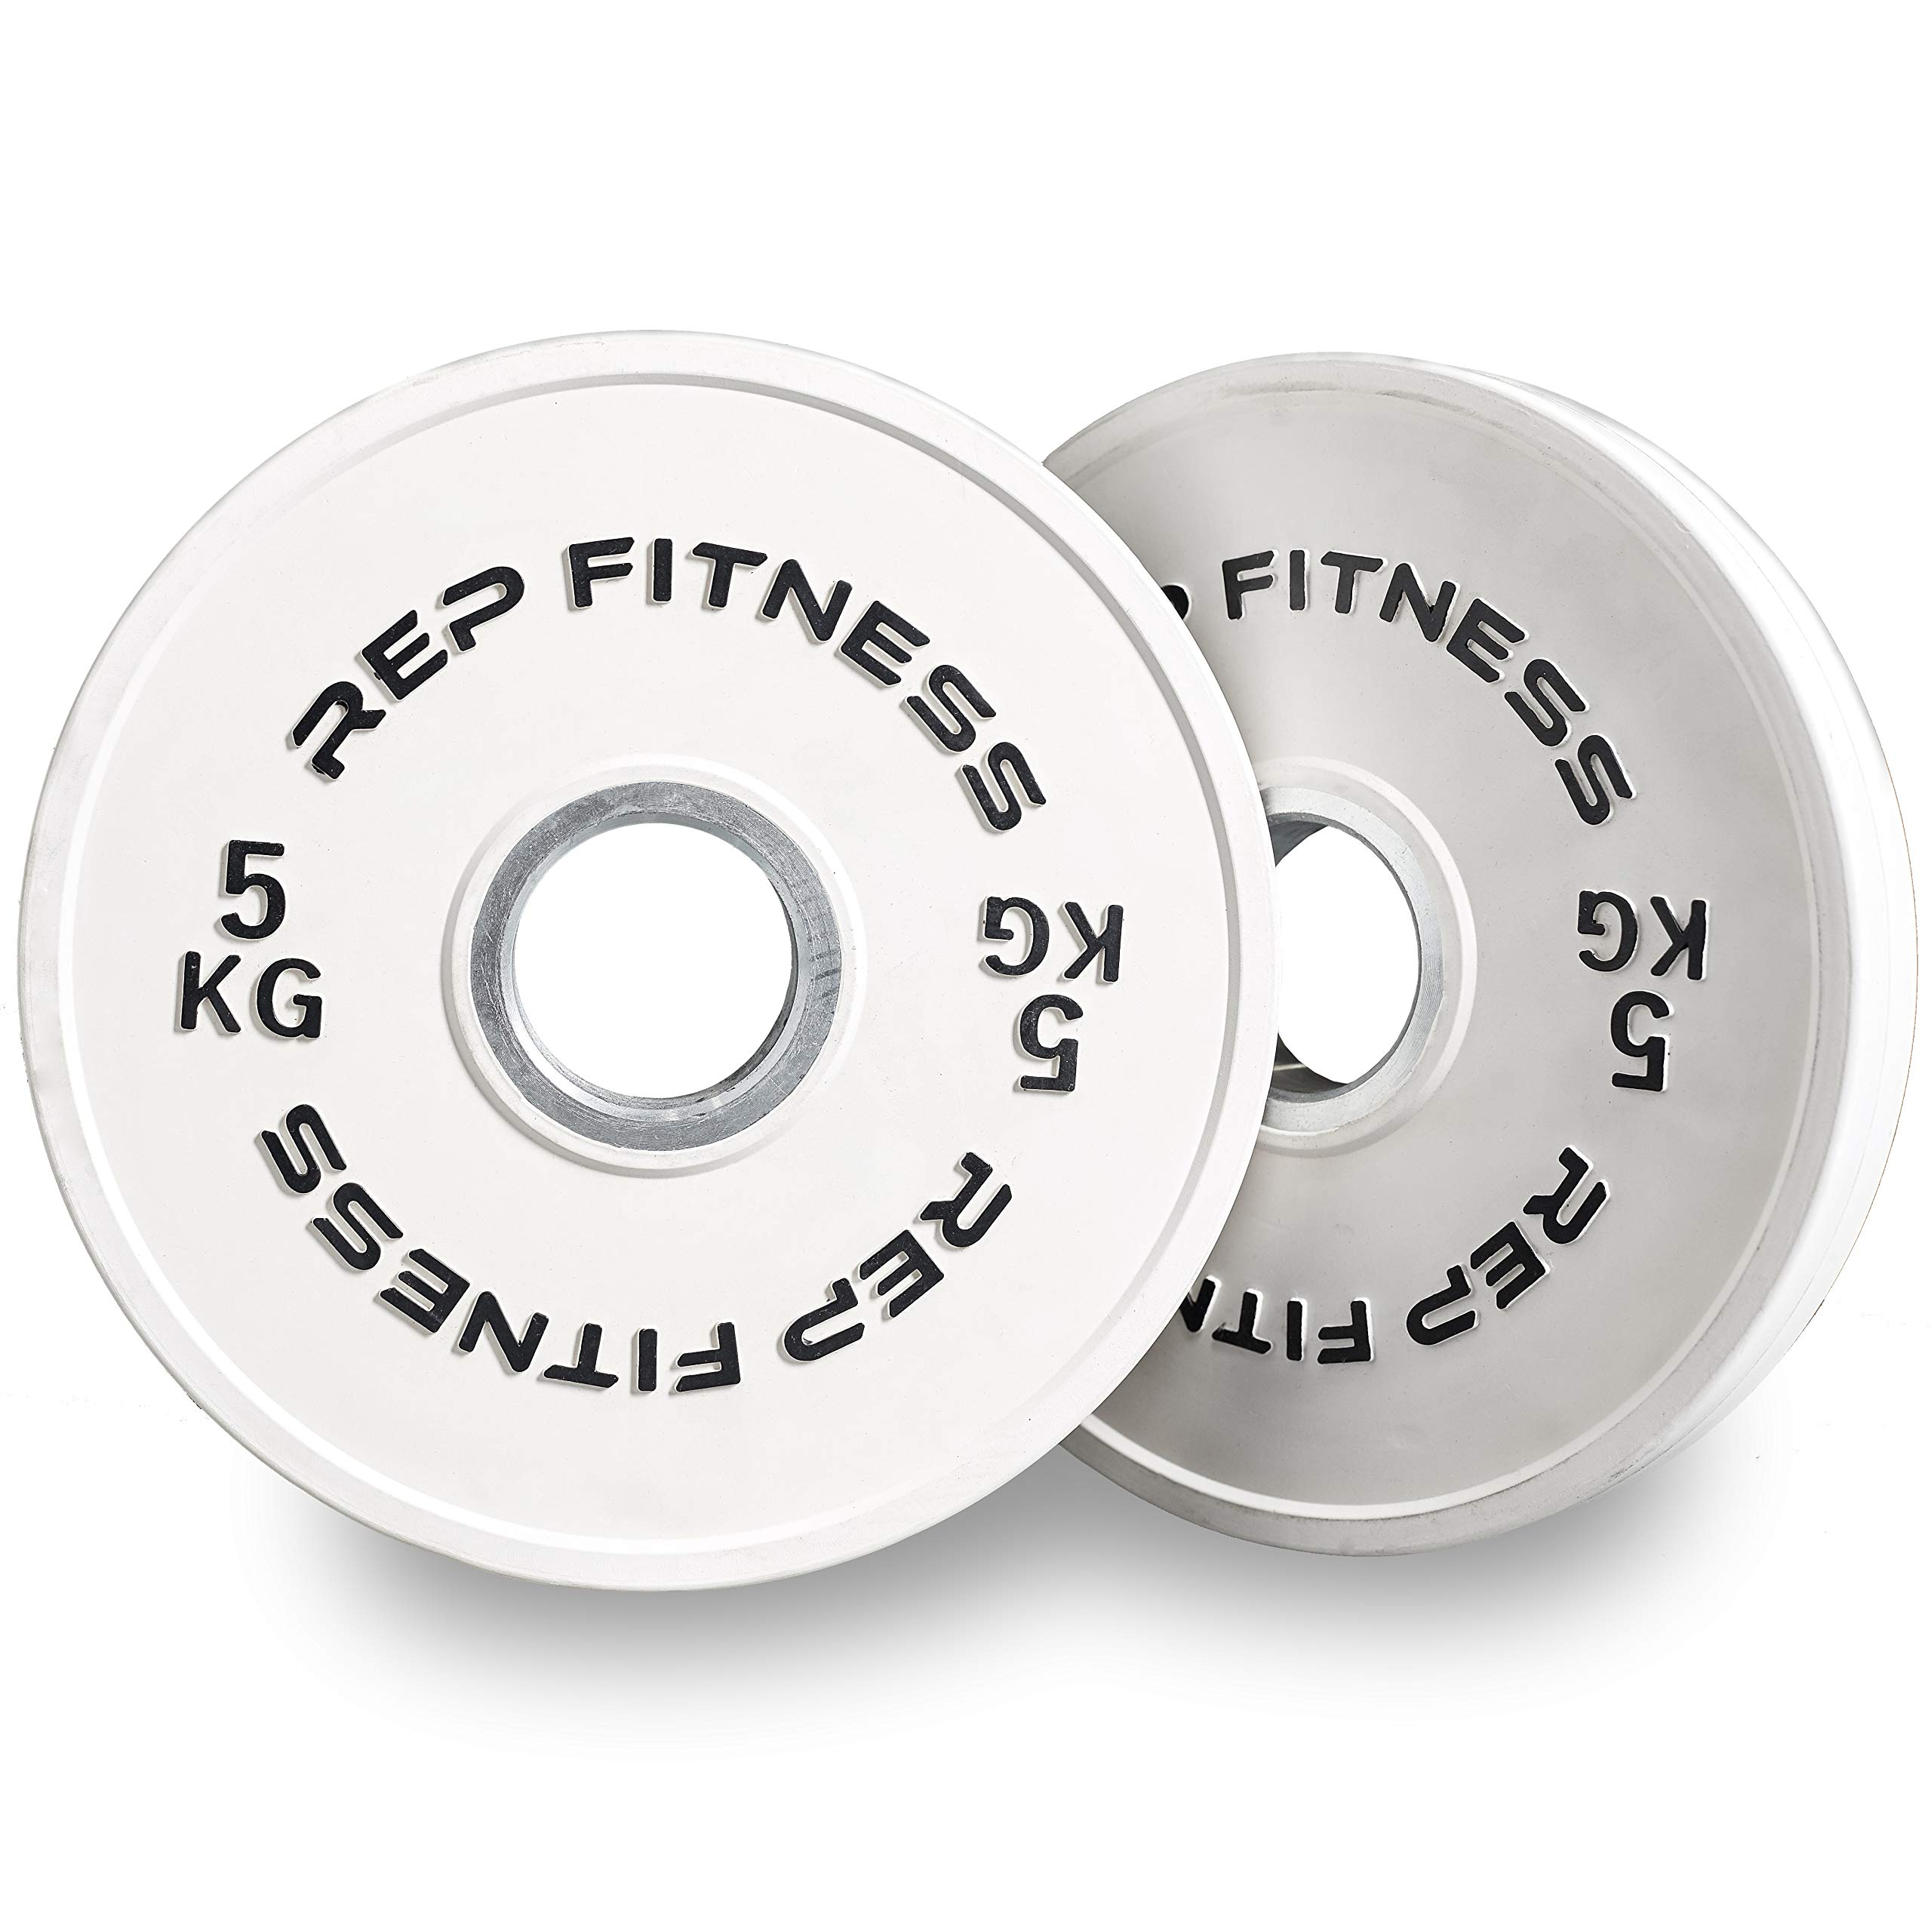 Rep Change Plates - 5.0 kg